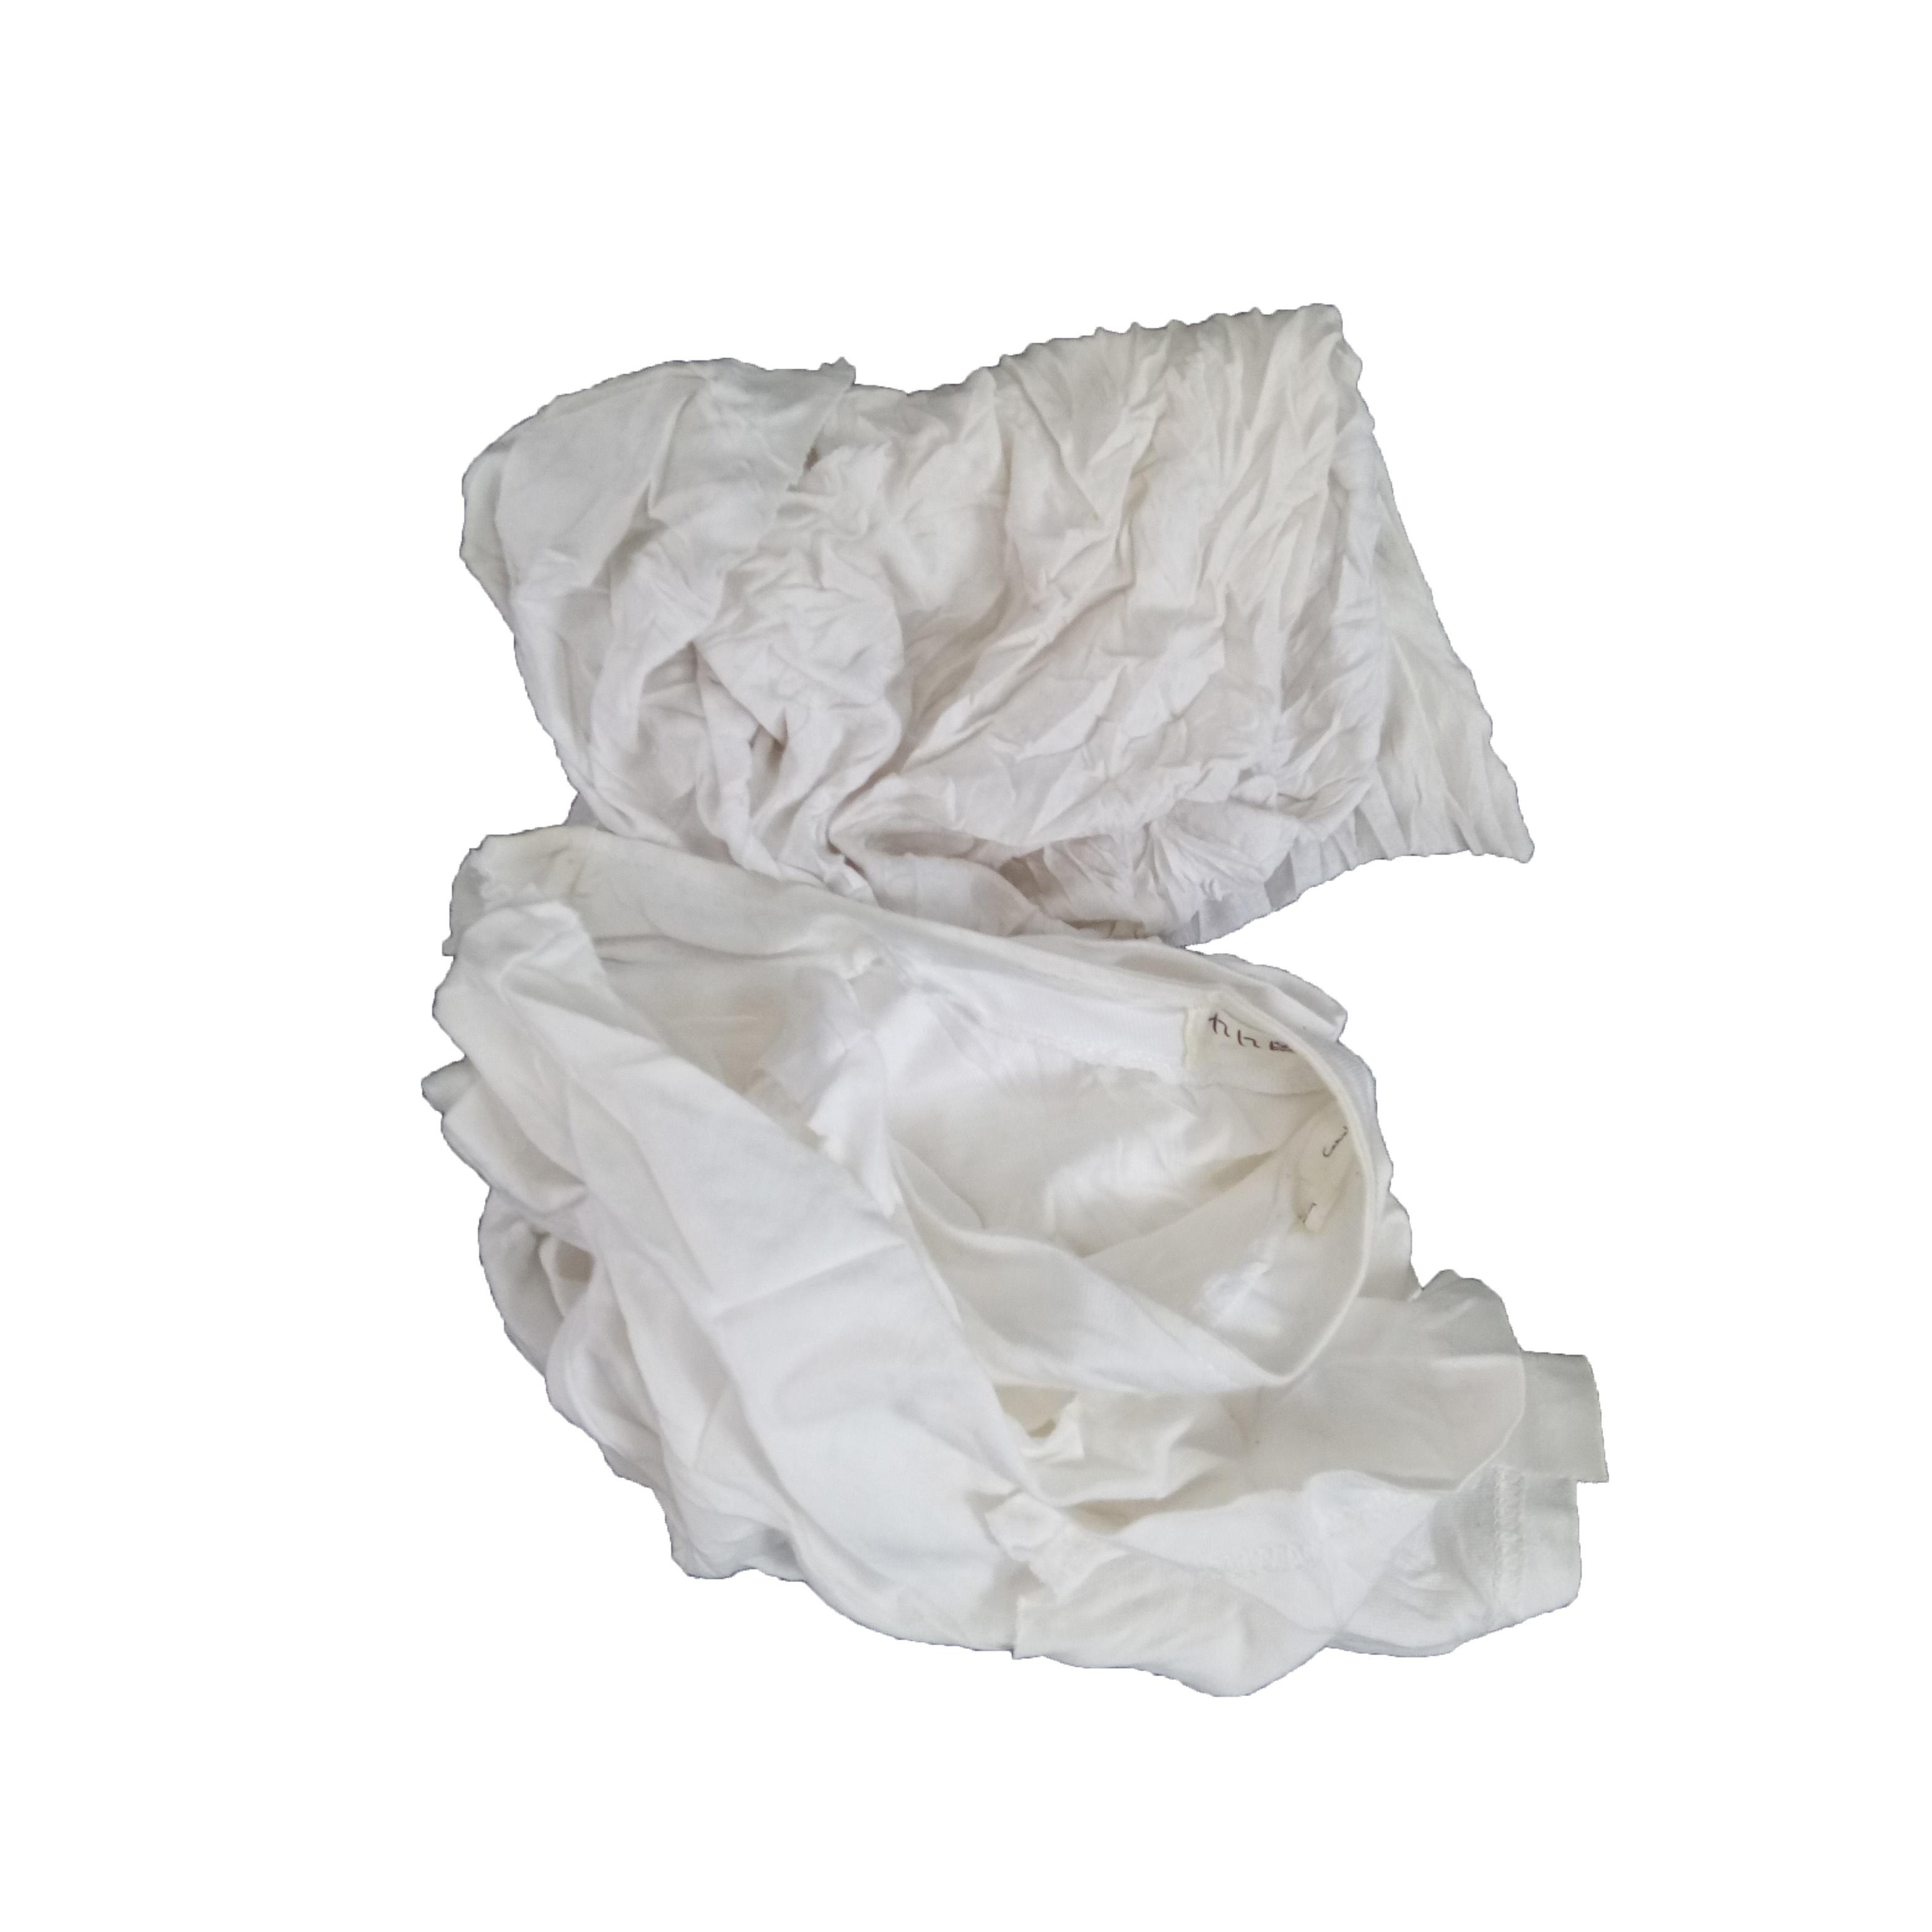 100% cotton material merit hosiery rags clips bulk waste